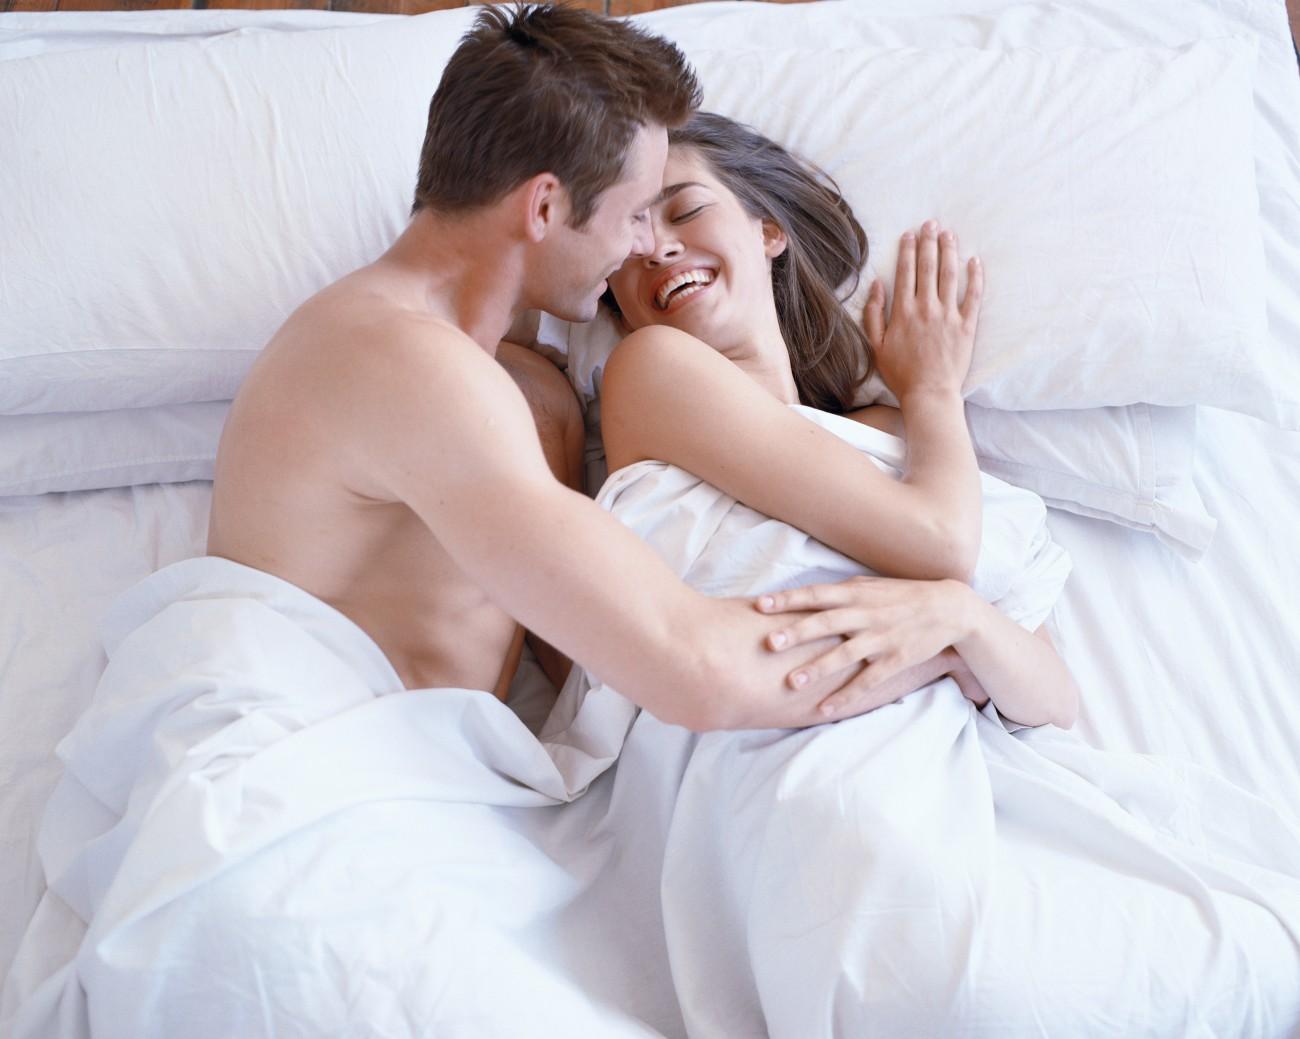 Naked woman seducing boyfriend — 6